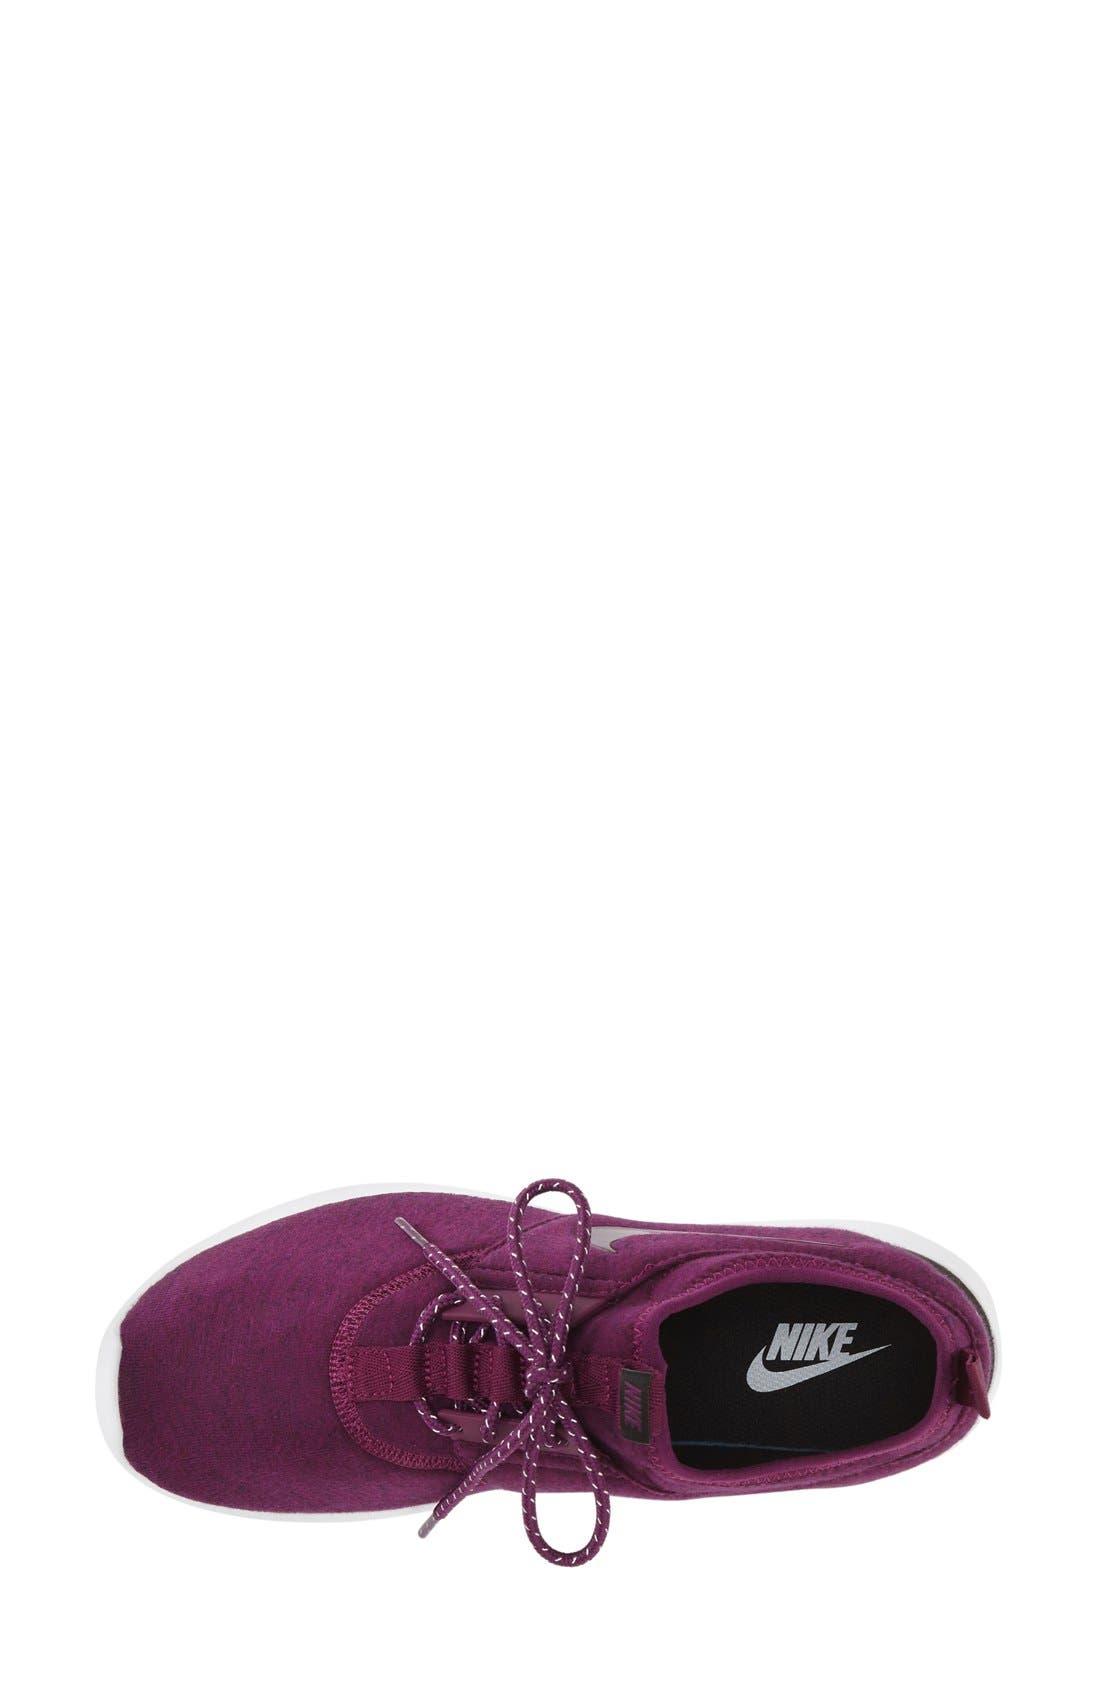 Alternate Image 3  - Nike 'Juvenate Fleece' Sneaker (Women)